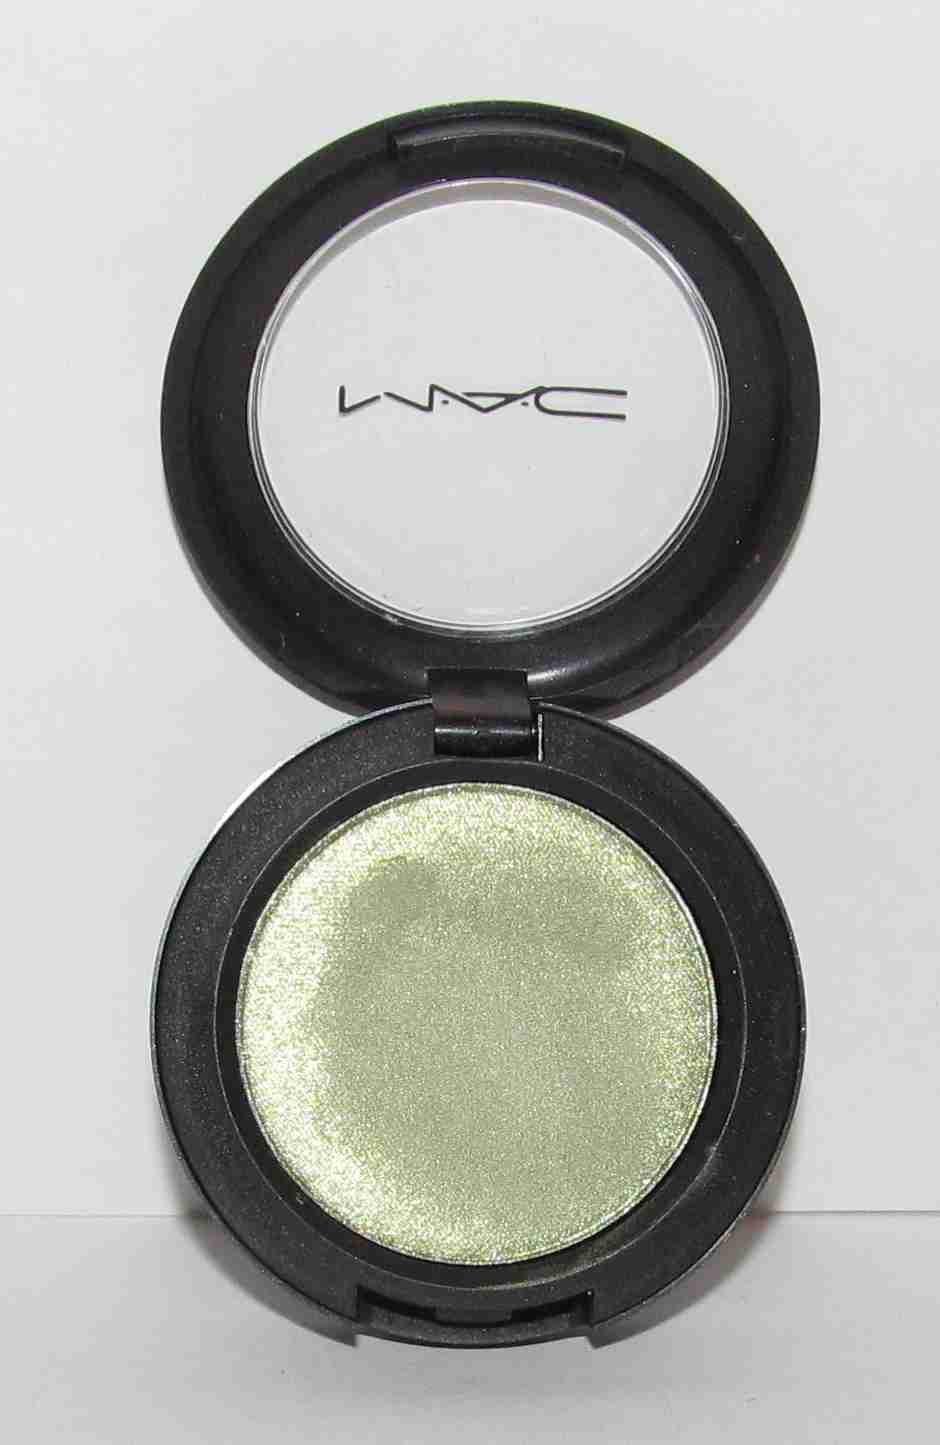 MAC Overtint Green - Colour Theory Eye Shadow - VHTF - RARE